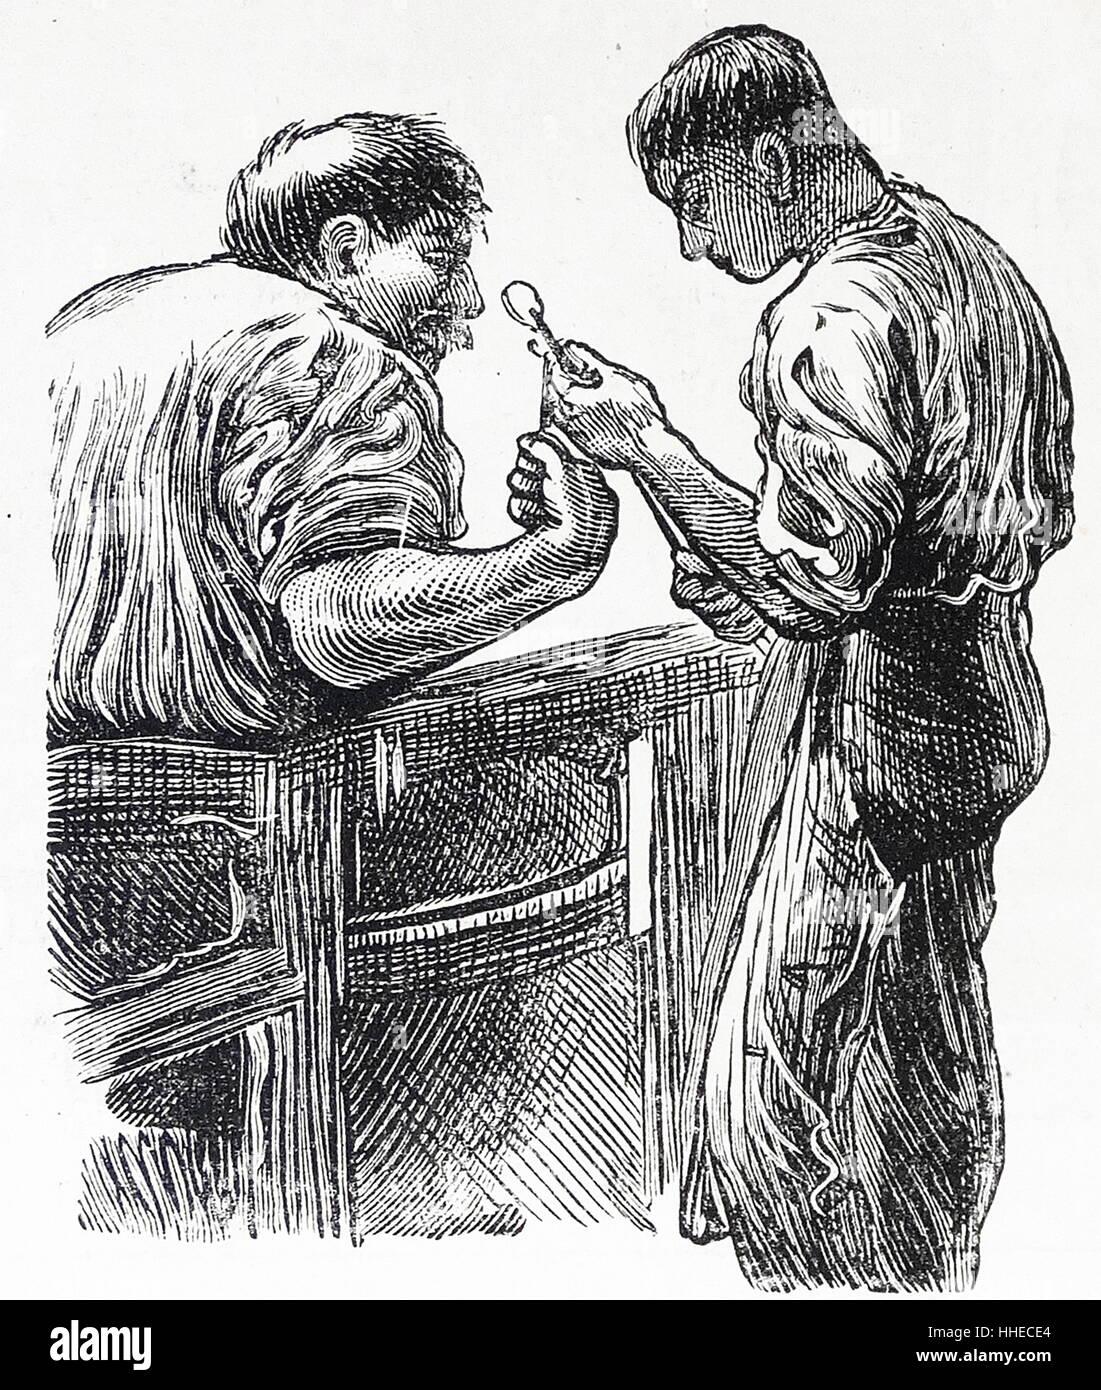 Venetian glass blowers. Venice, Italy 1884 Stock Photo